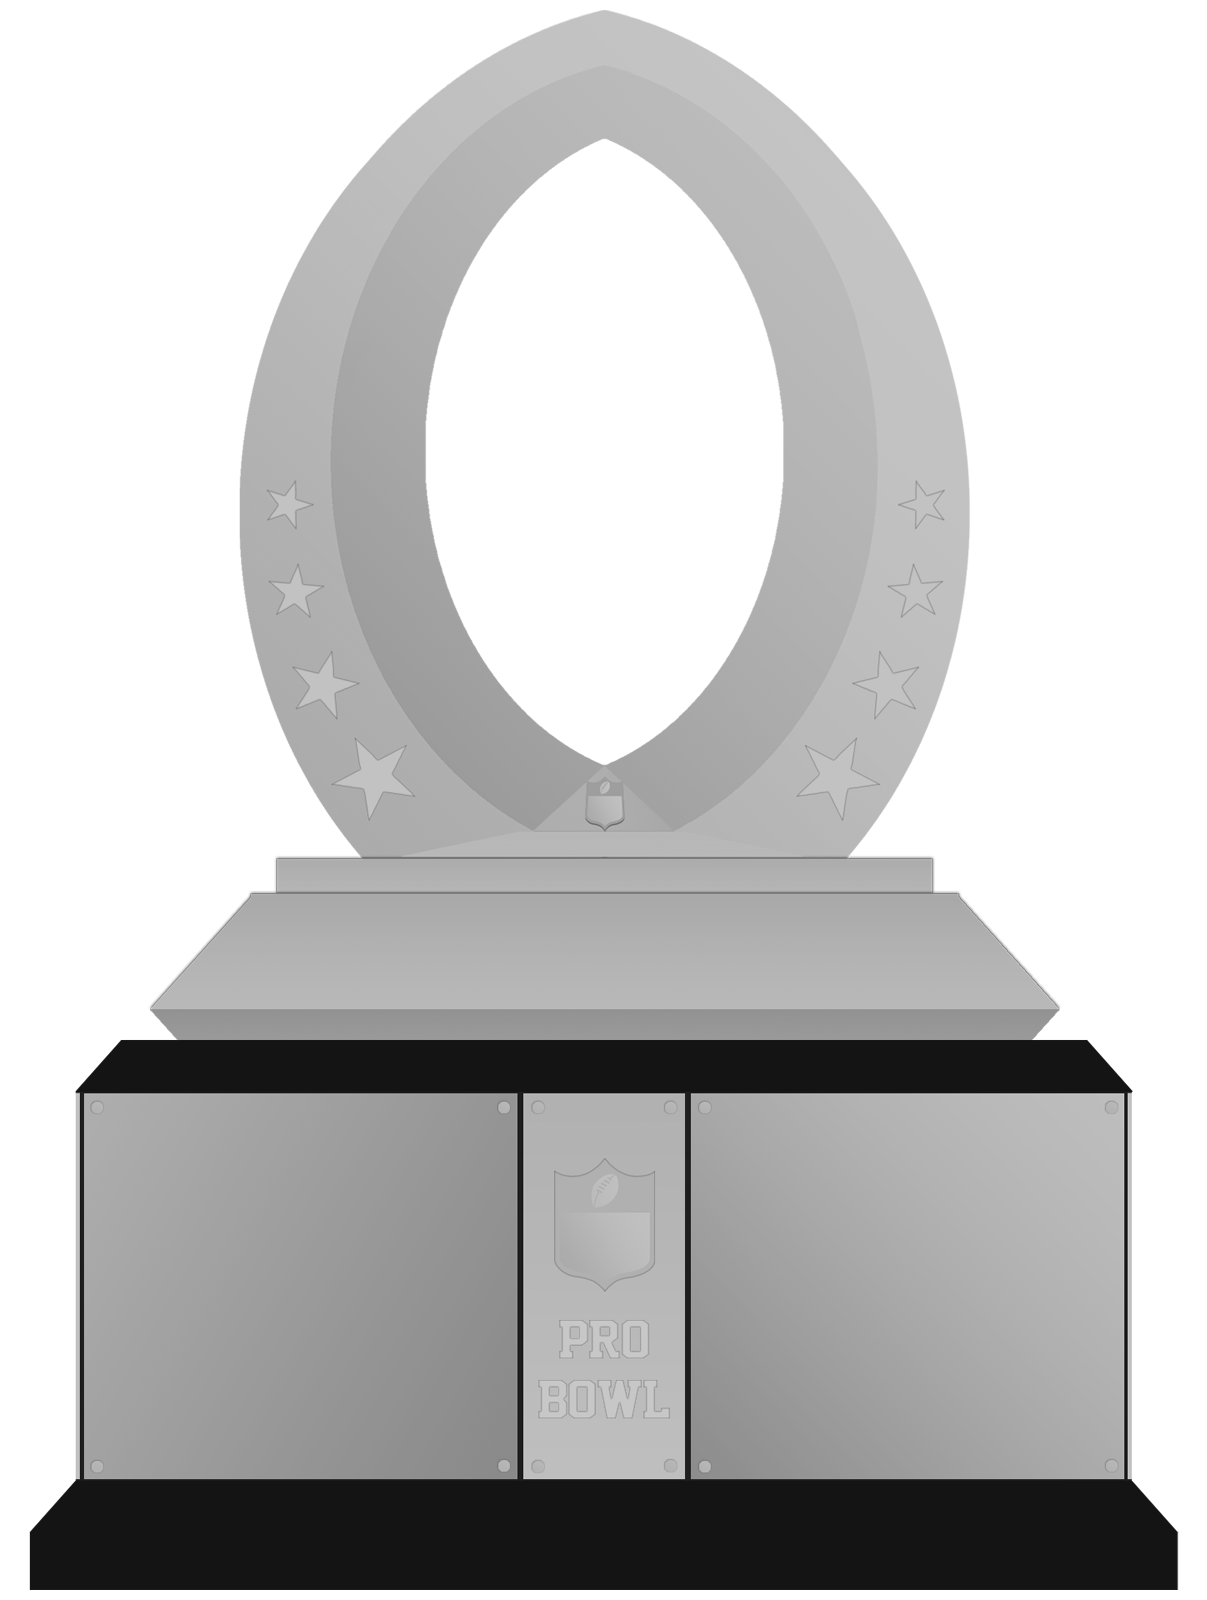 FilePro Bowl MVP